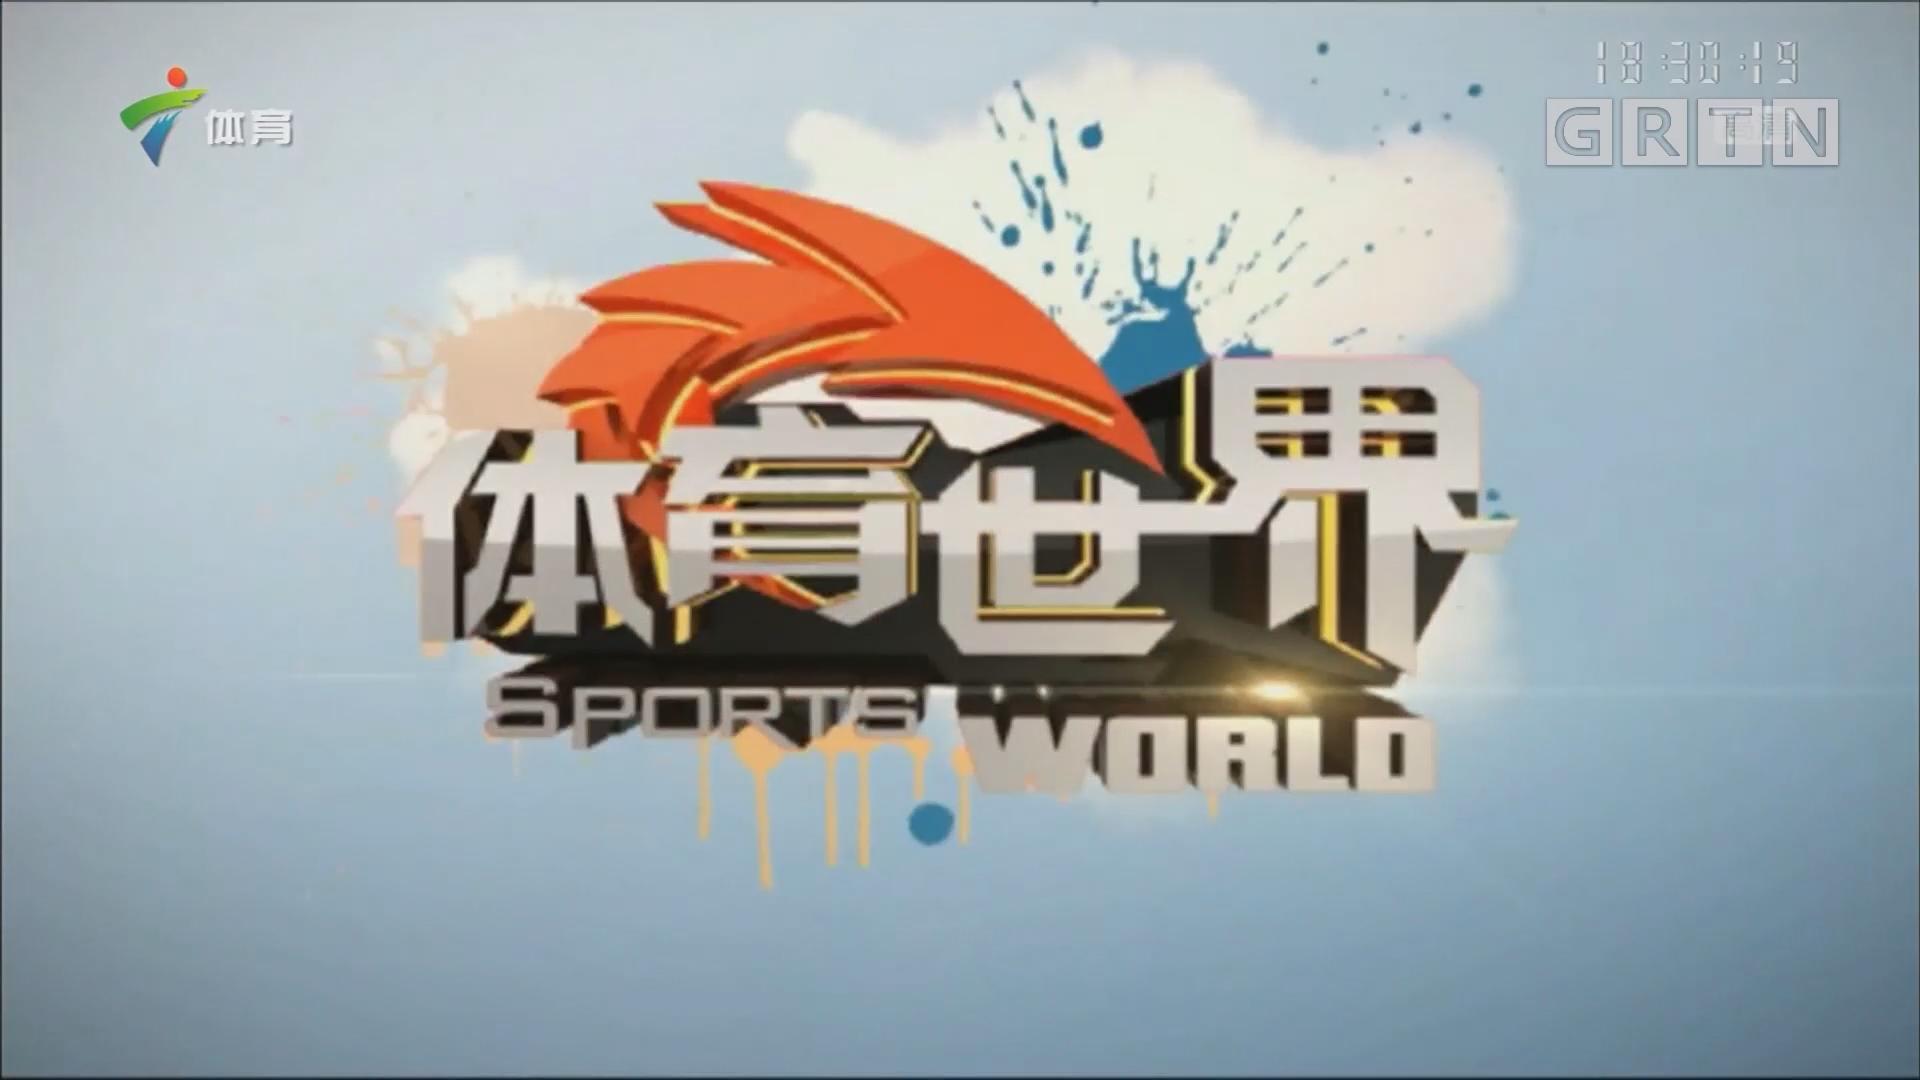 [HD][2017-12-20]体育世界:广东省青少年男足乙组锦标赛收官 广州勇夺冠军